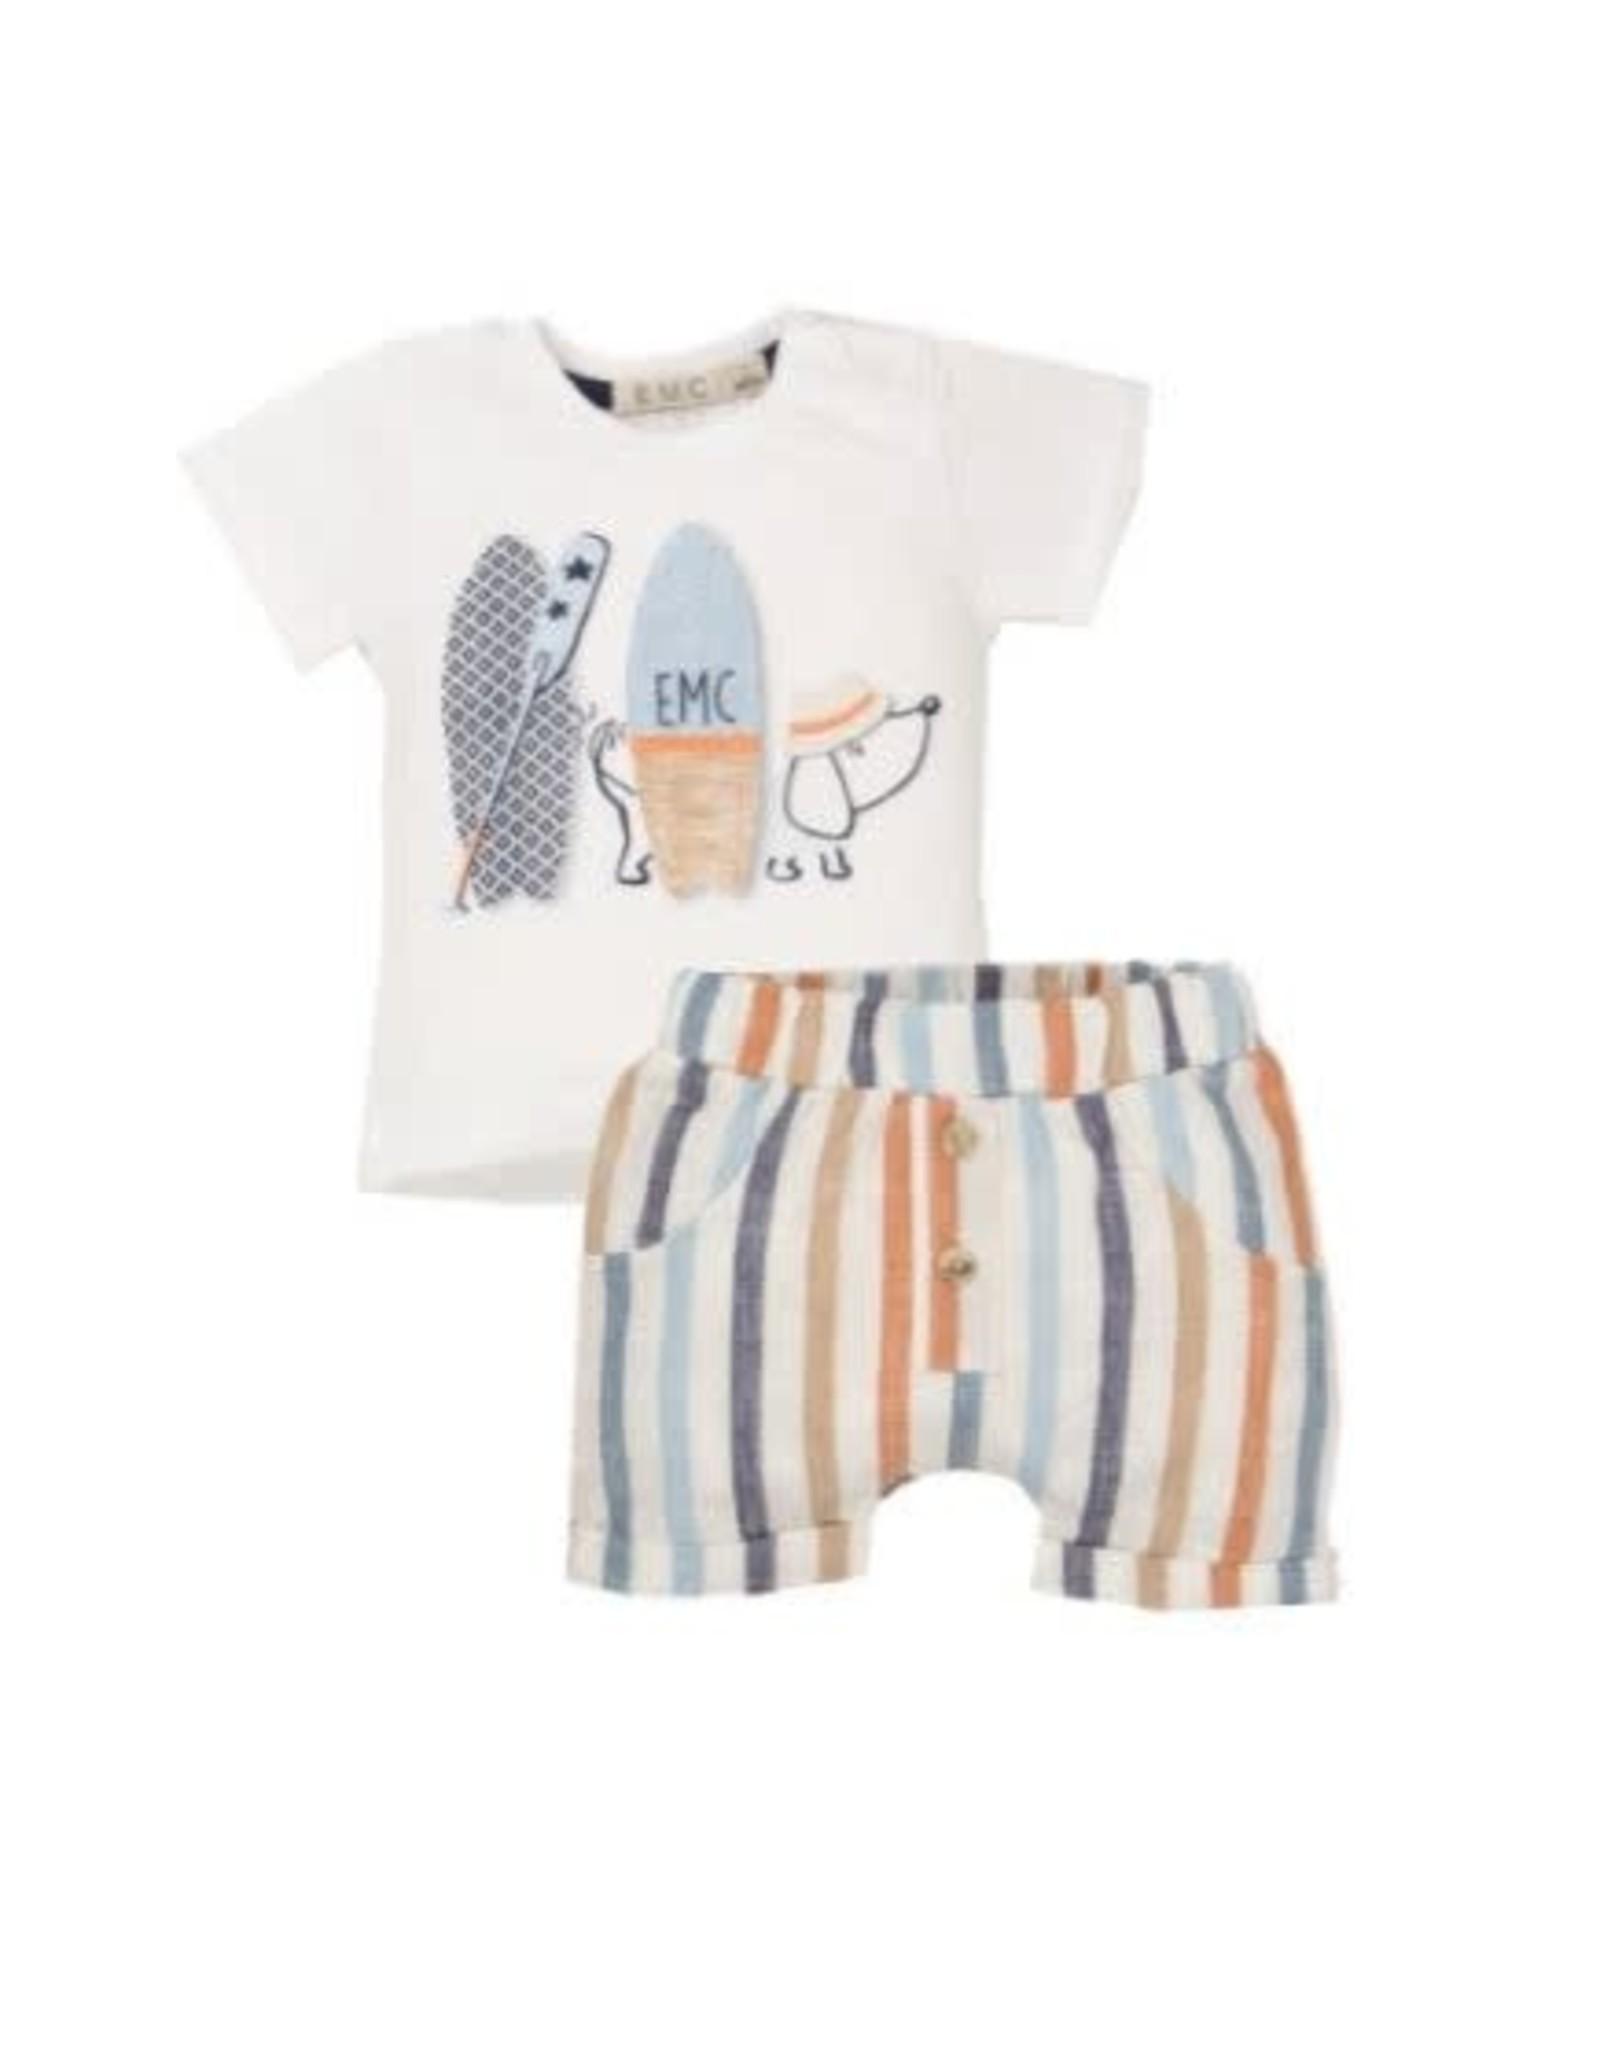 EMC T-Shirt and Striped Short Set